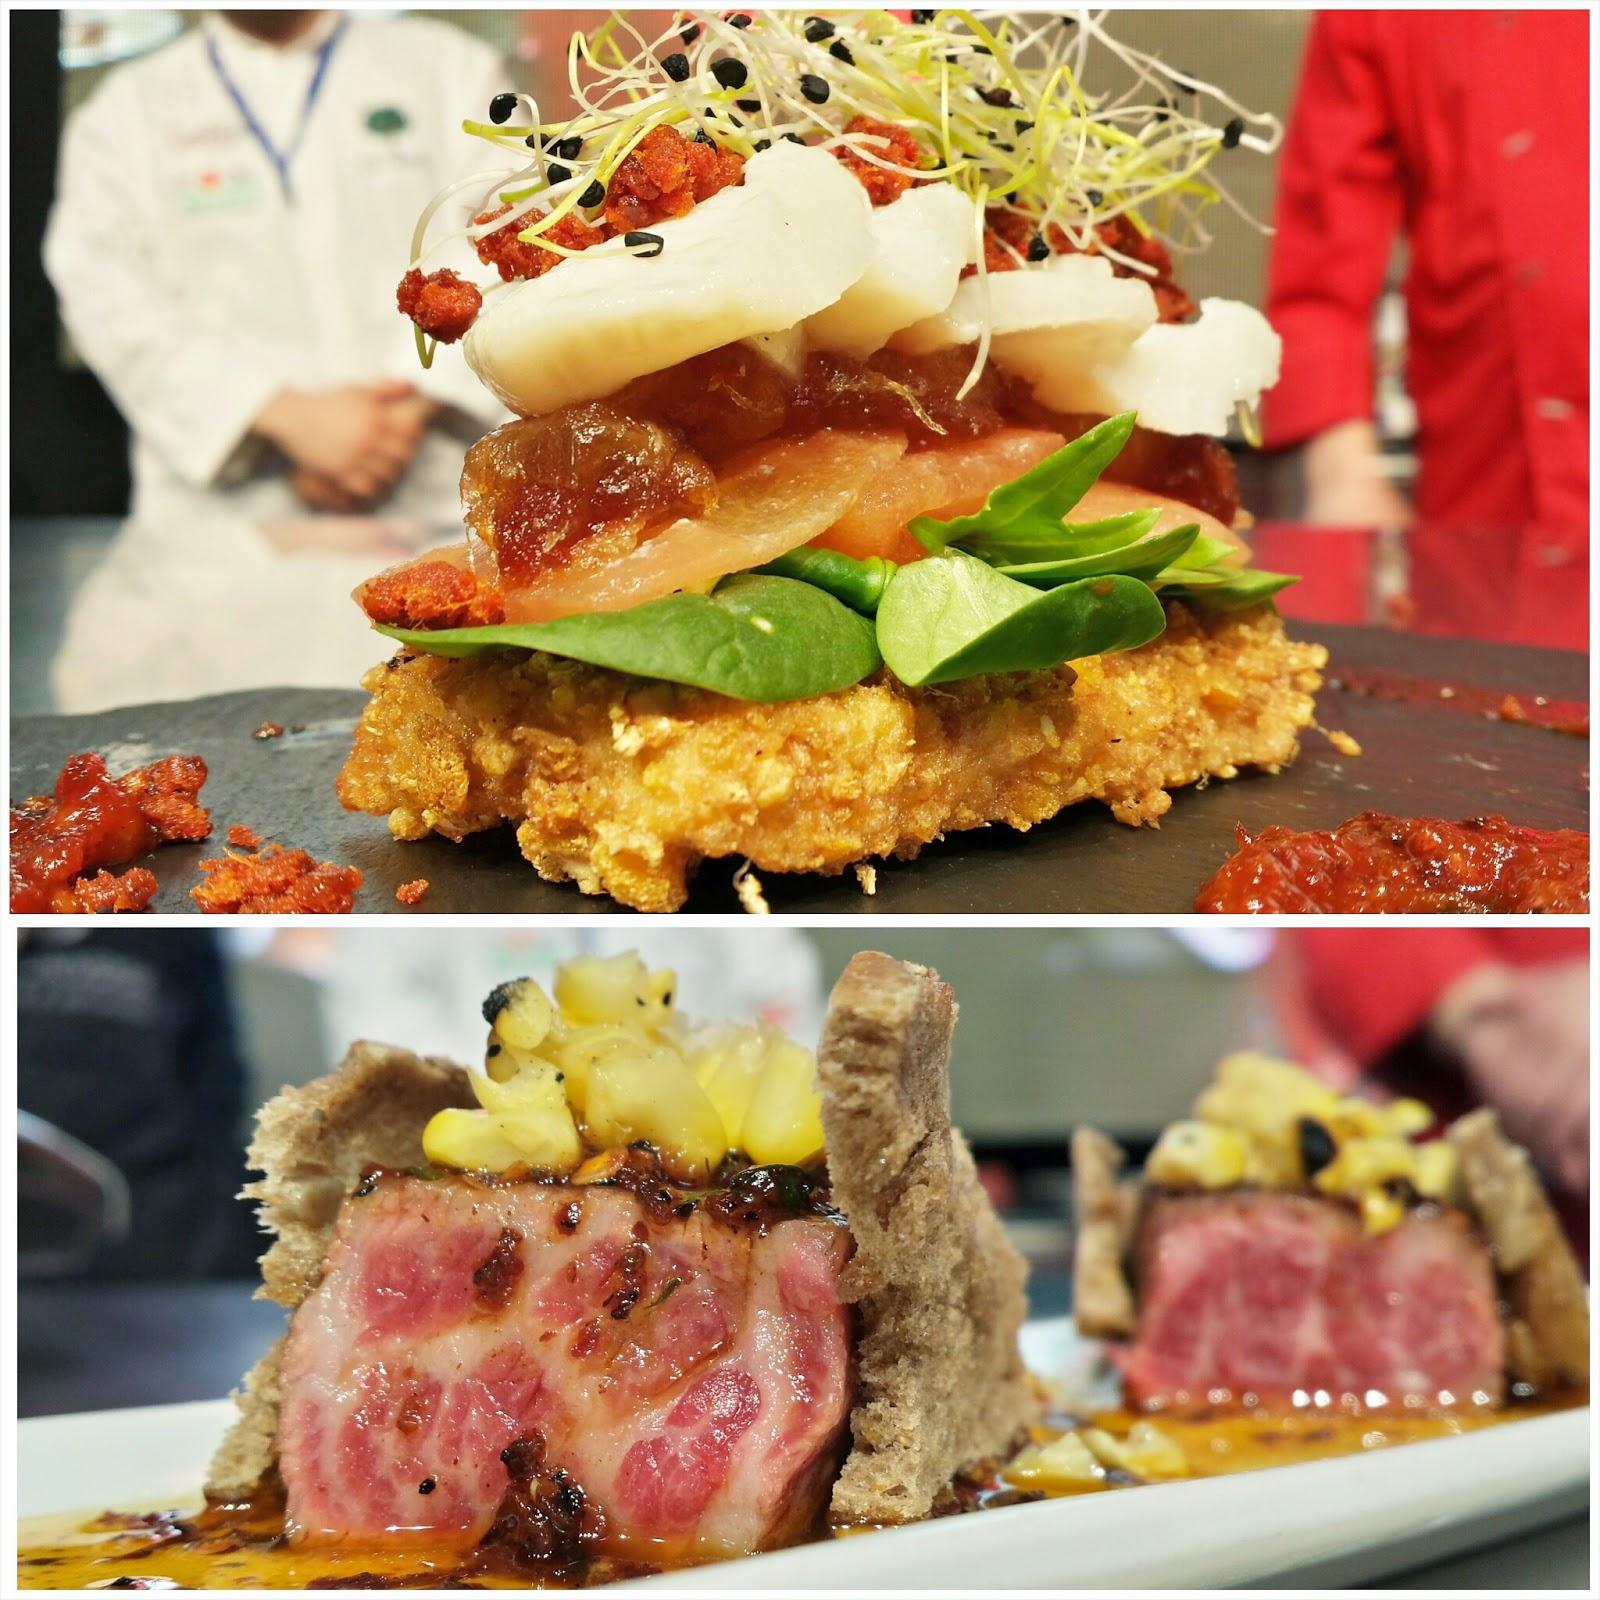 GastroAlicante 2015 - Pintxo Kalea